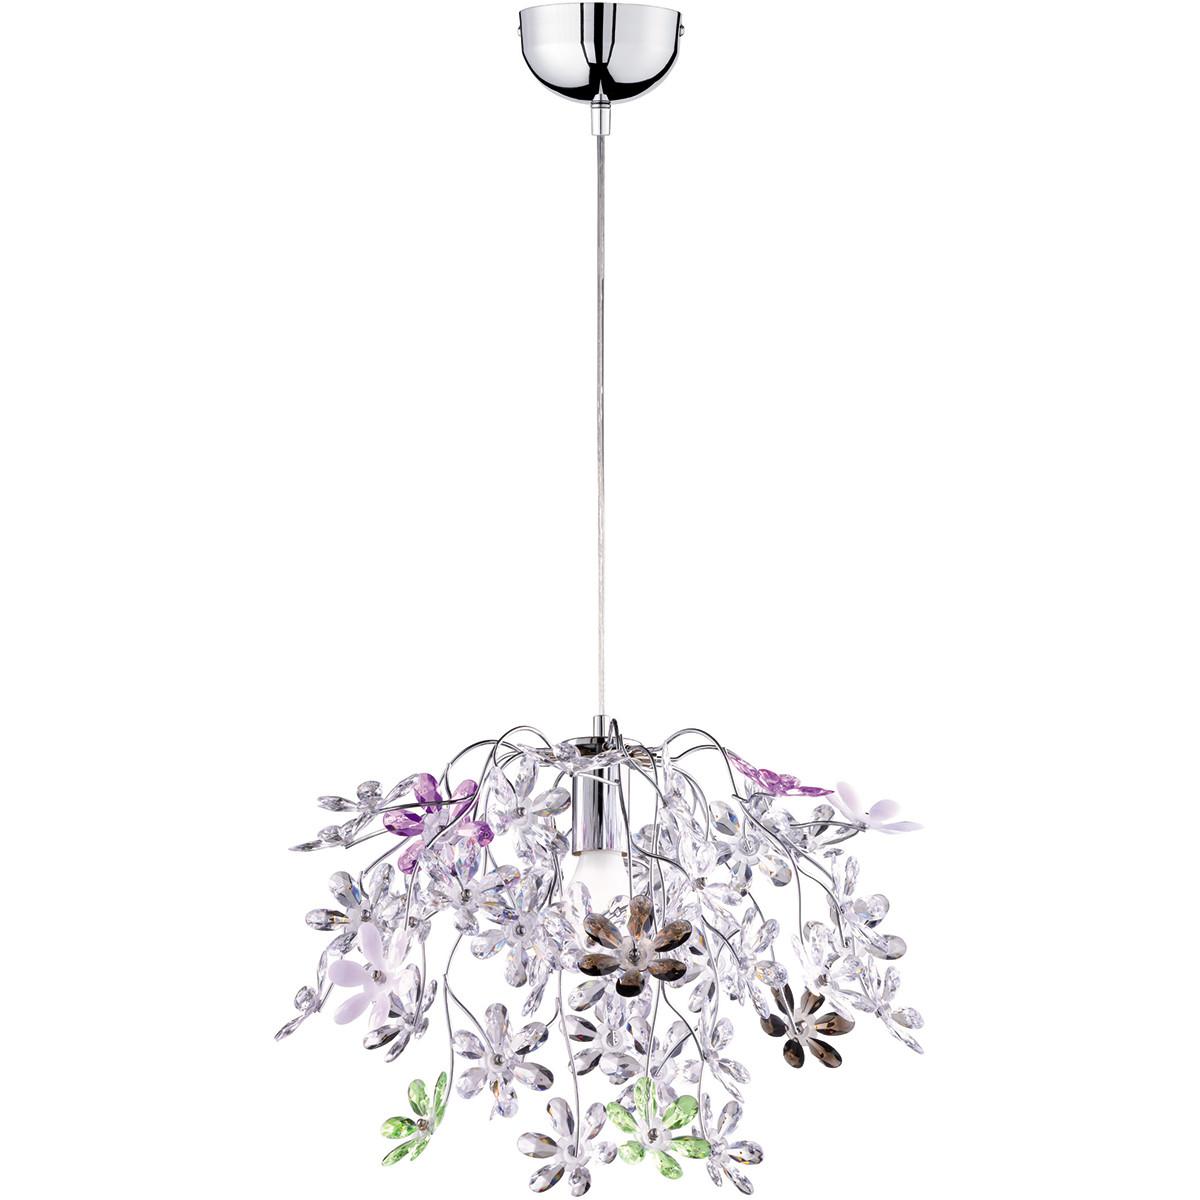 LED Hanglamp - Hangverlichting - Trion Flowy - E27 Fitting - 1-lichts - Rond - Glans Chroom - Alumin